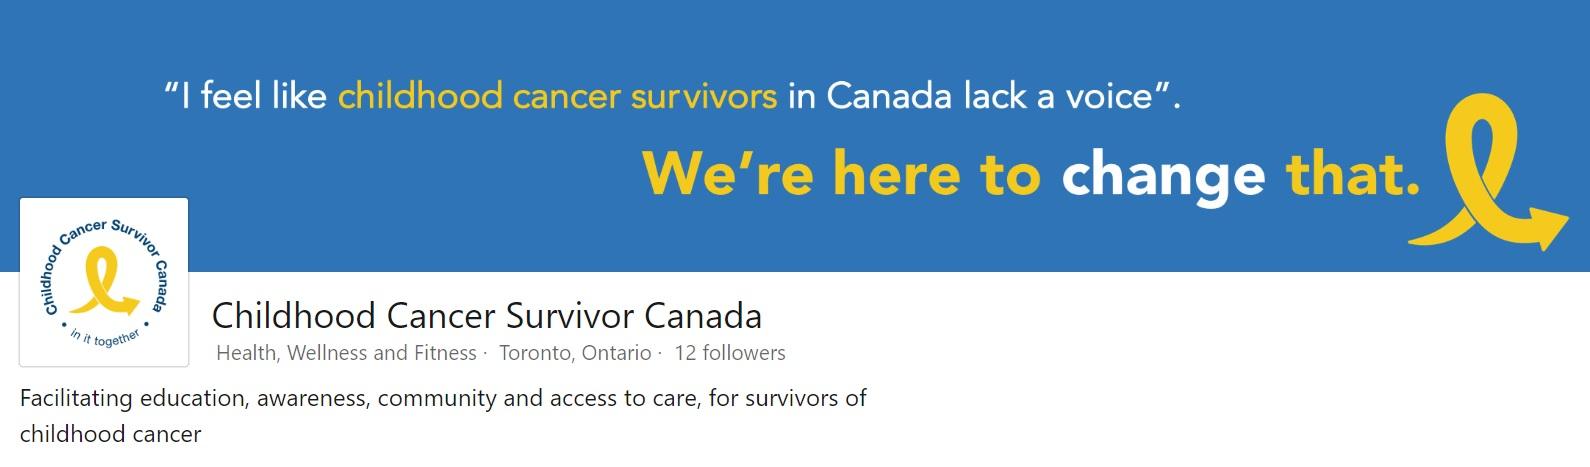 Childhoodcancer survivor cancada.jpg